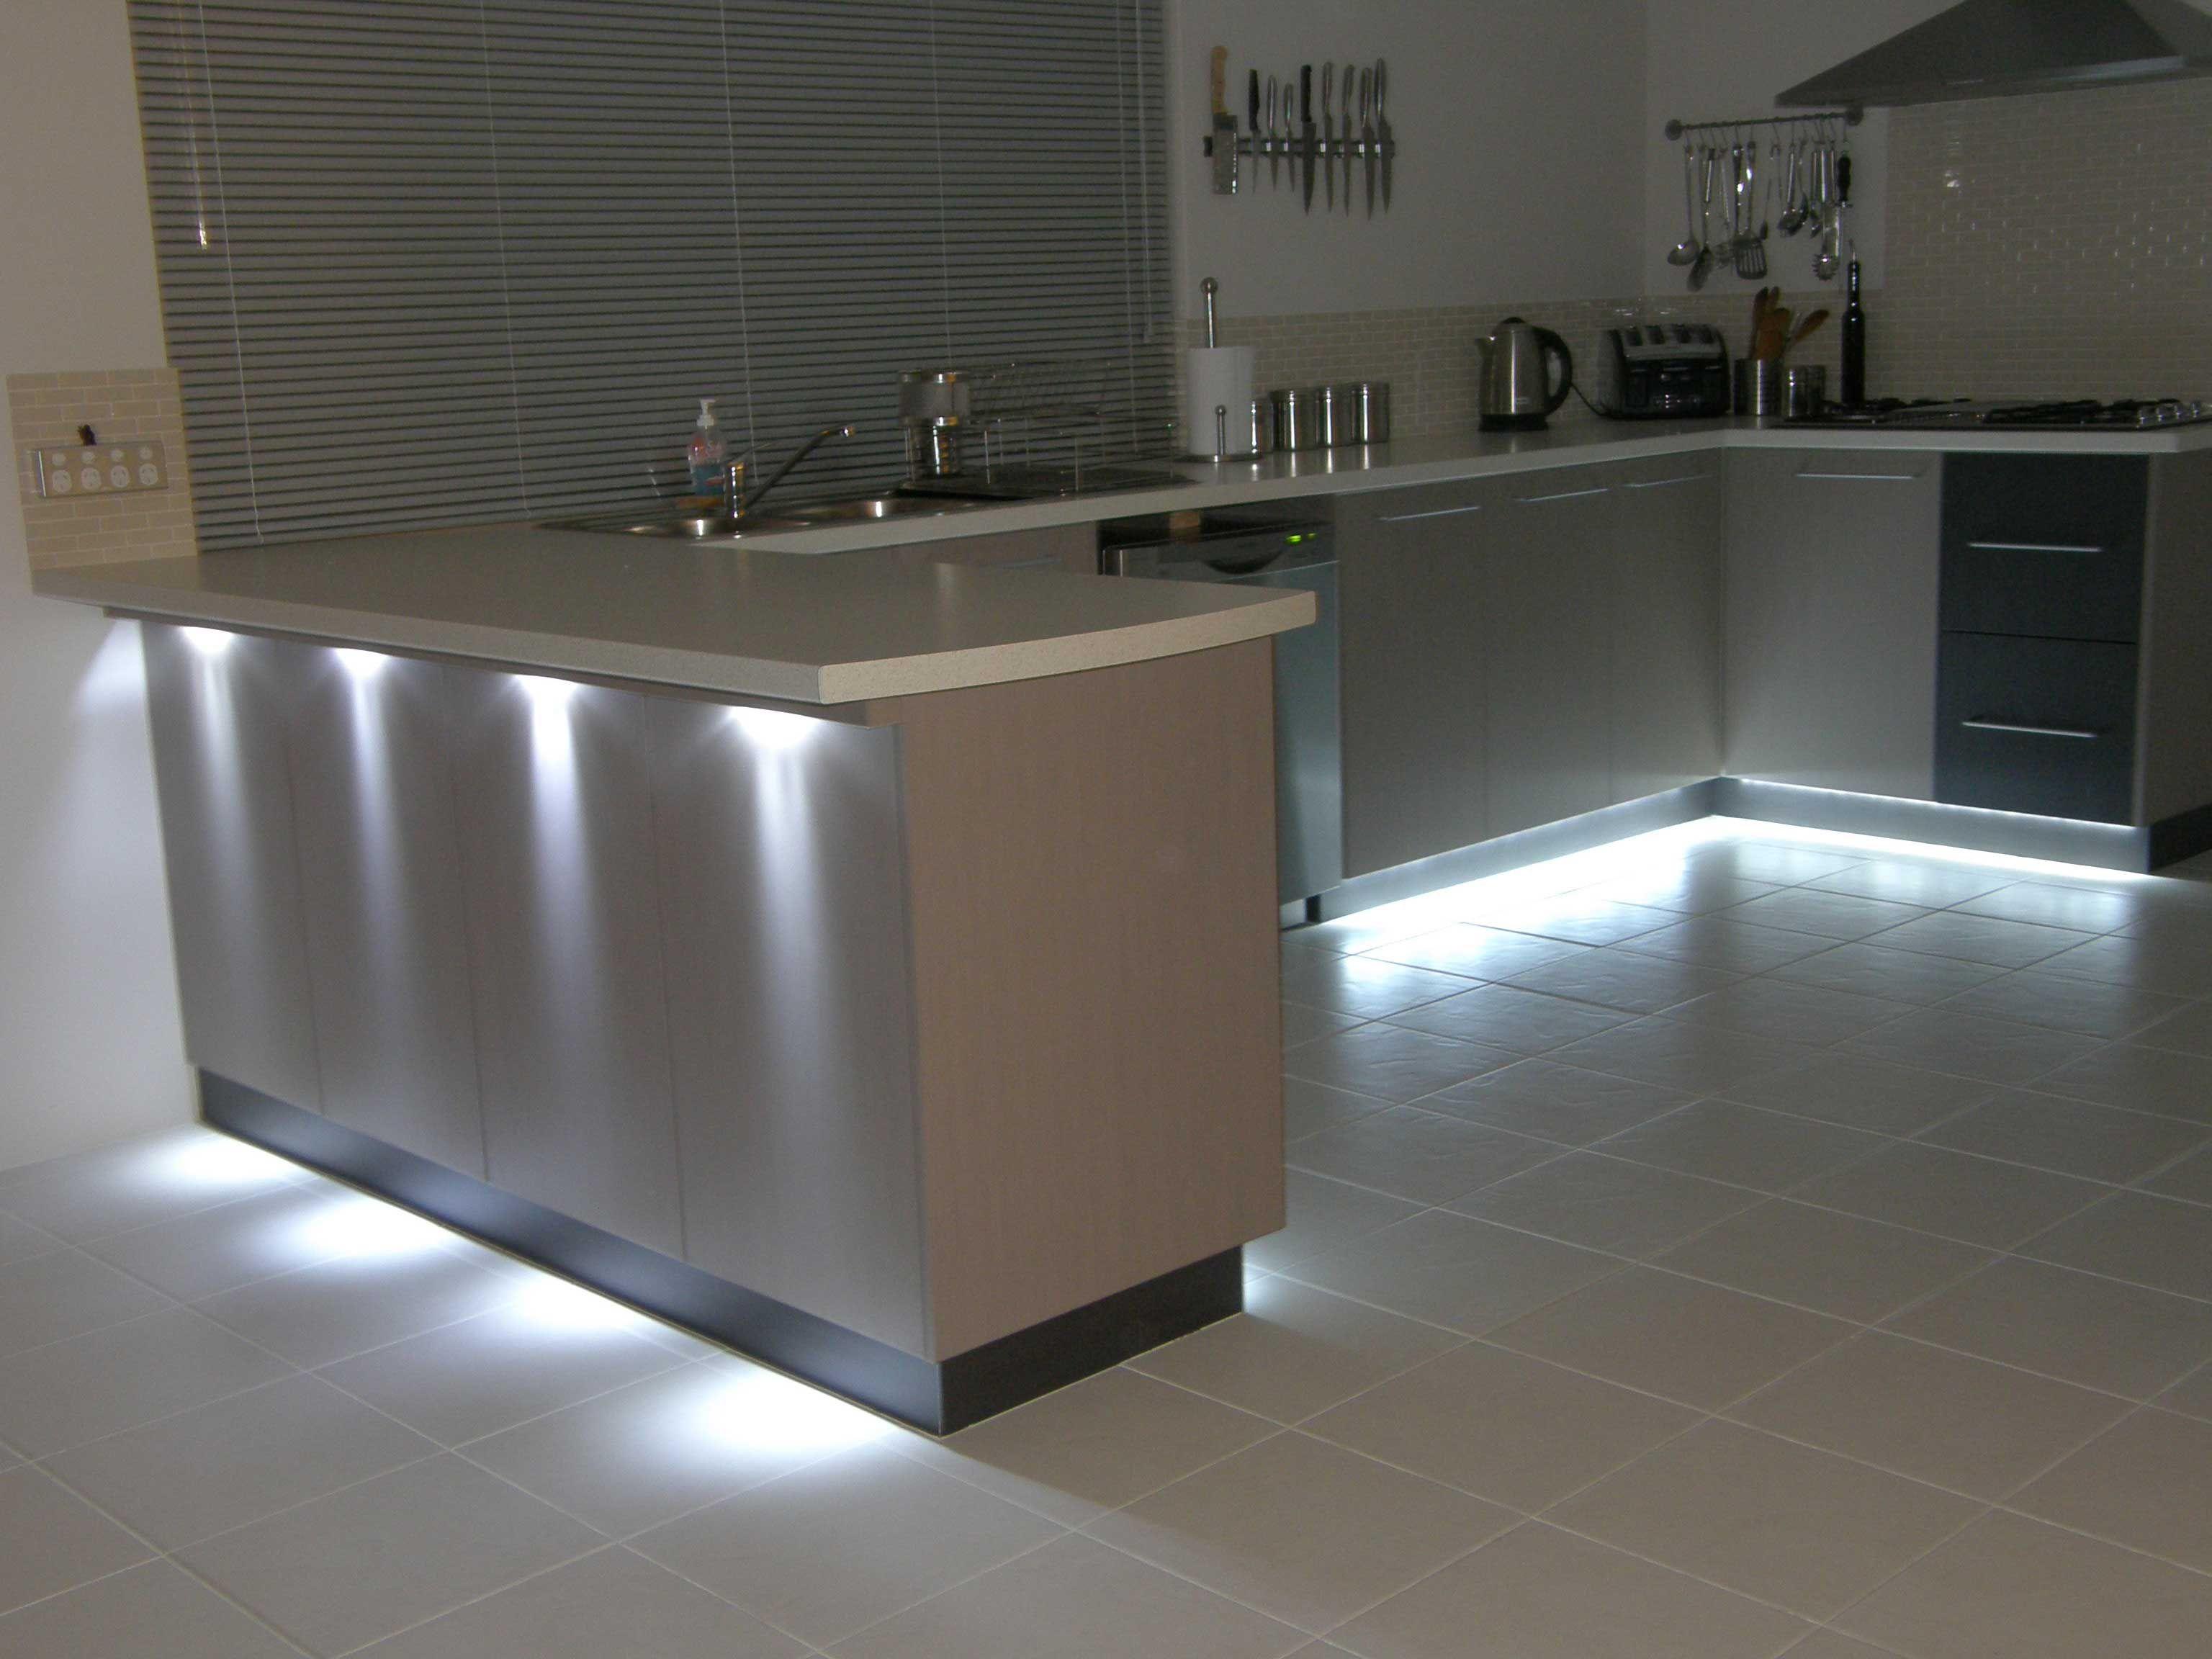 29 Inspiring Kitchen Lighting Ideas Kitchen Led Lighting Kitchen Under Cabinet Lighting Light Kitchen Cabinets